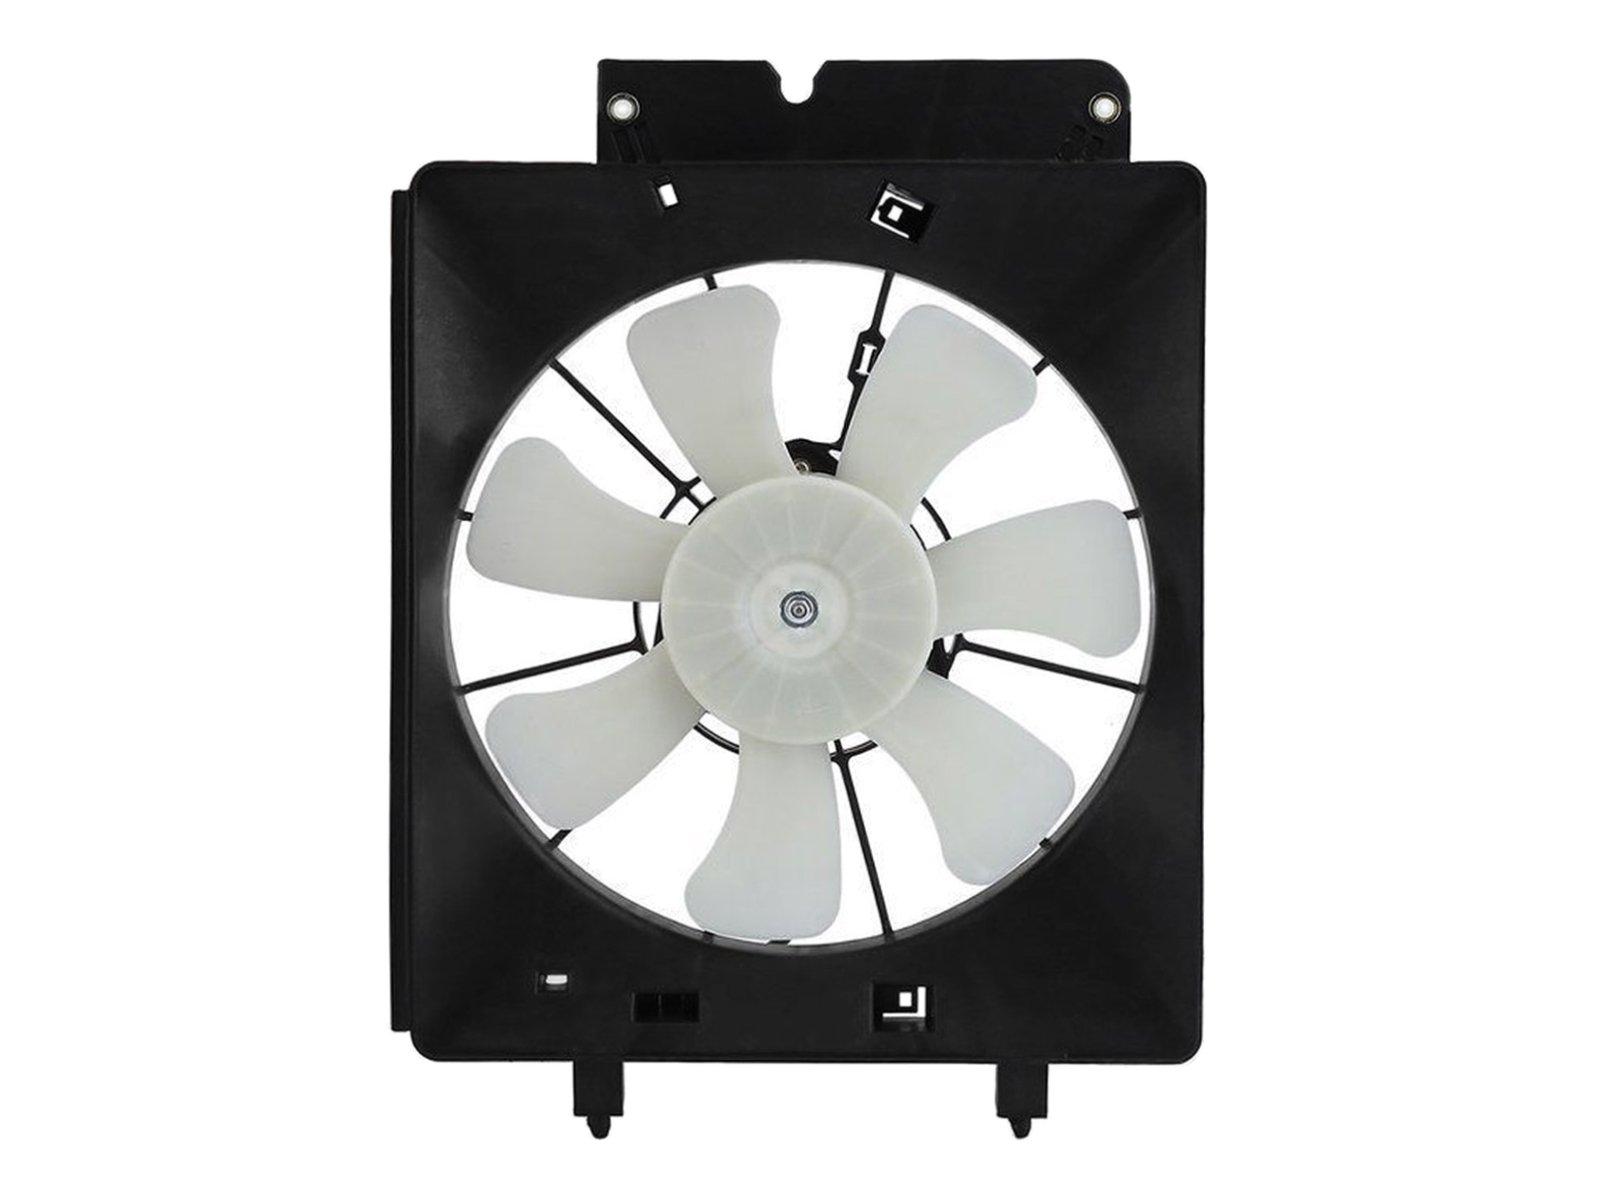 AC A/C CONDENSER COOLING FAN FOR HONDA FITS CR-V ELEMENT 2.4 L4 HO3113116 by Sunbelt Radiators